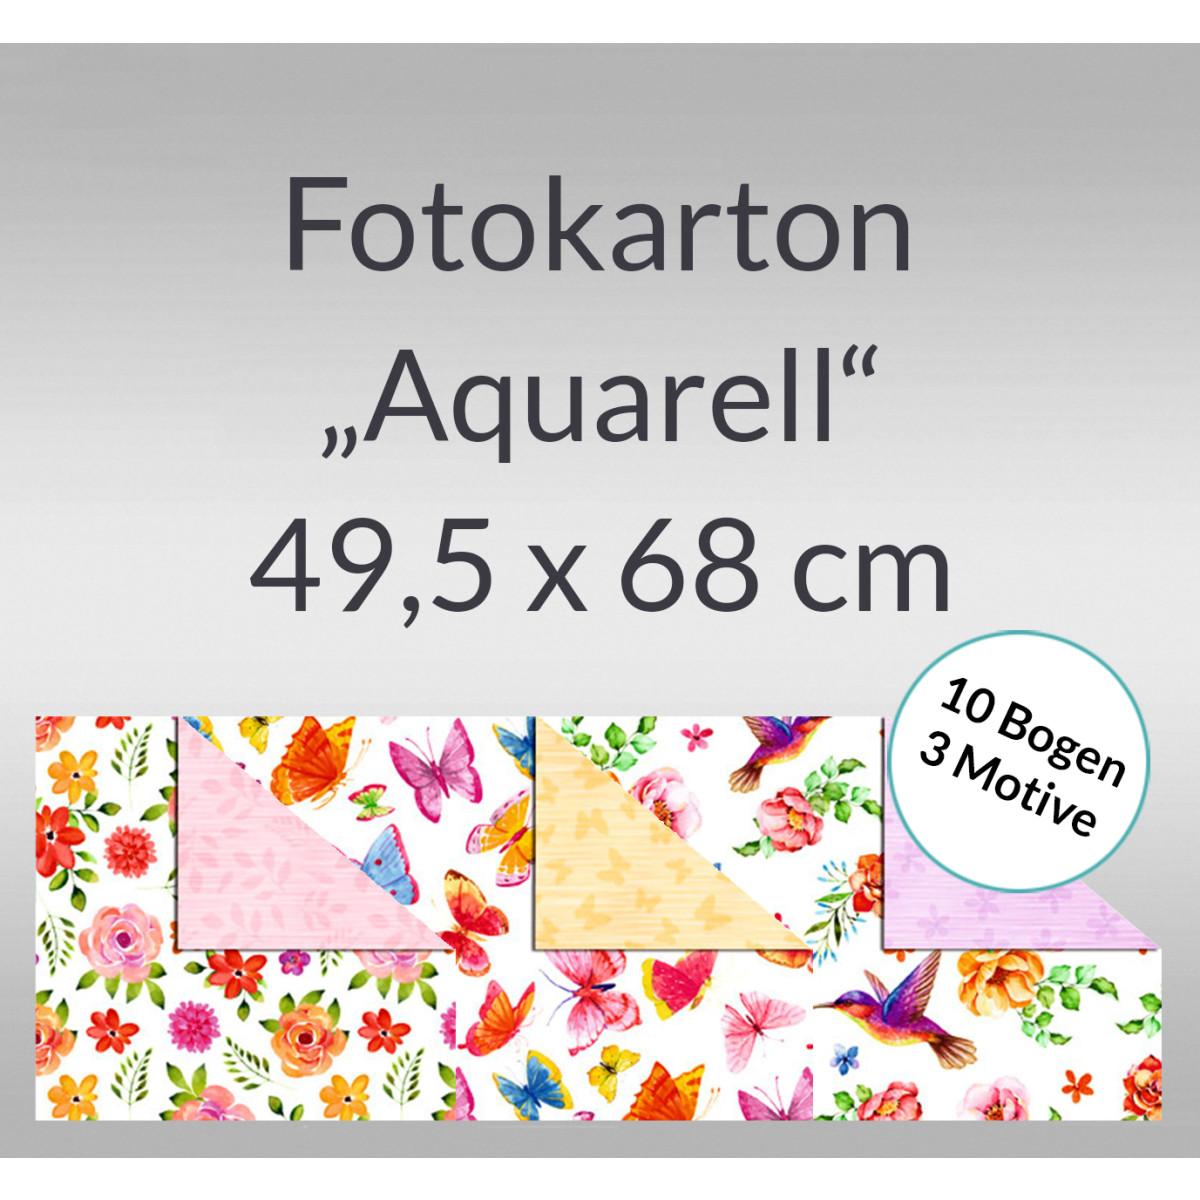 "Fotokarton ""Aquarell"" 49,5 x 68 cm - 10 Bogen sortiert"